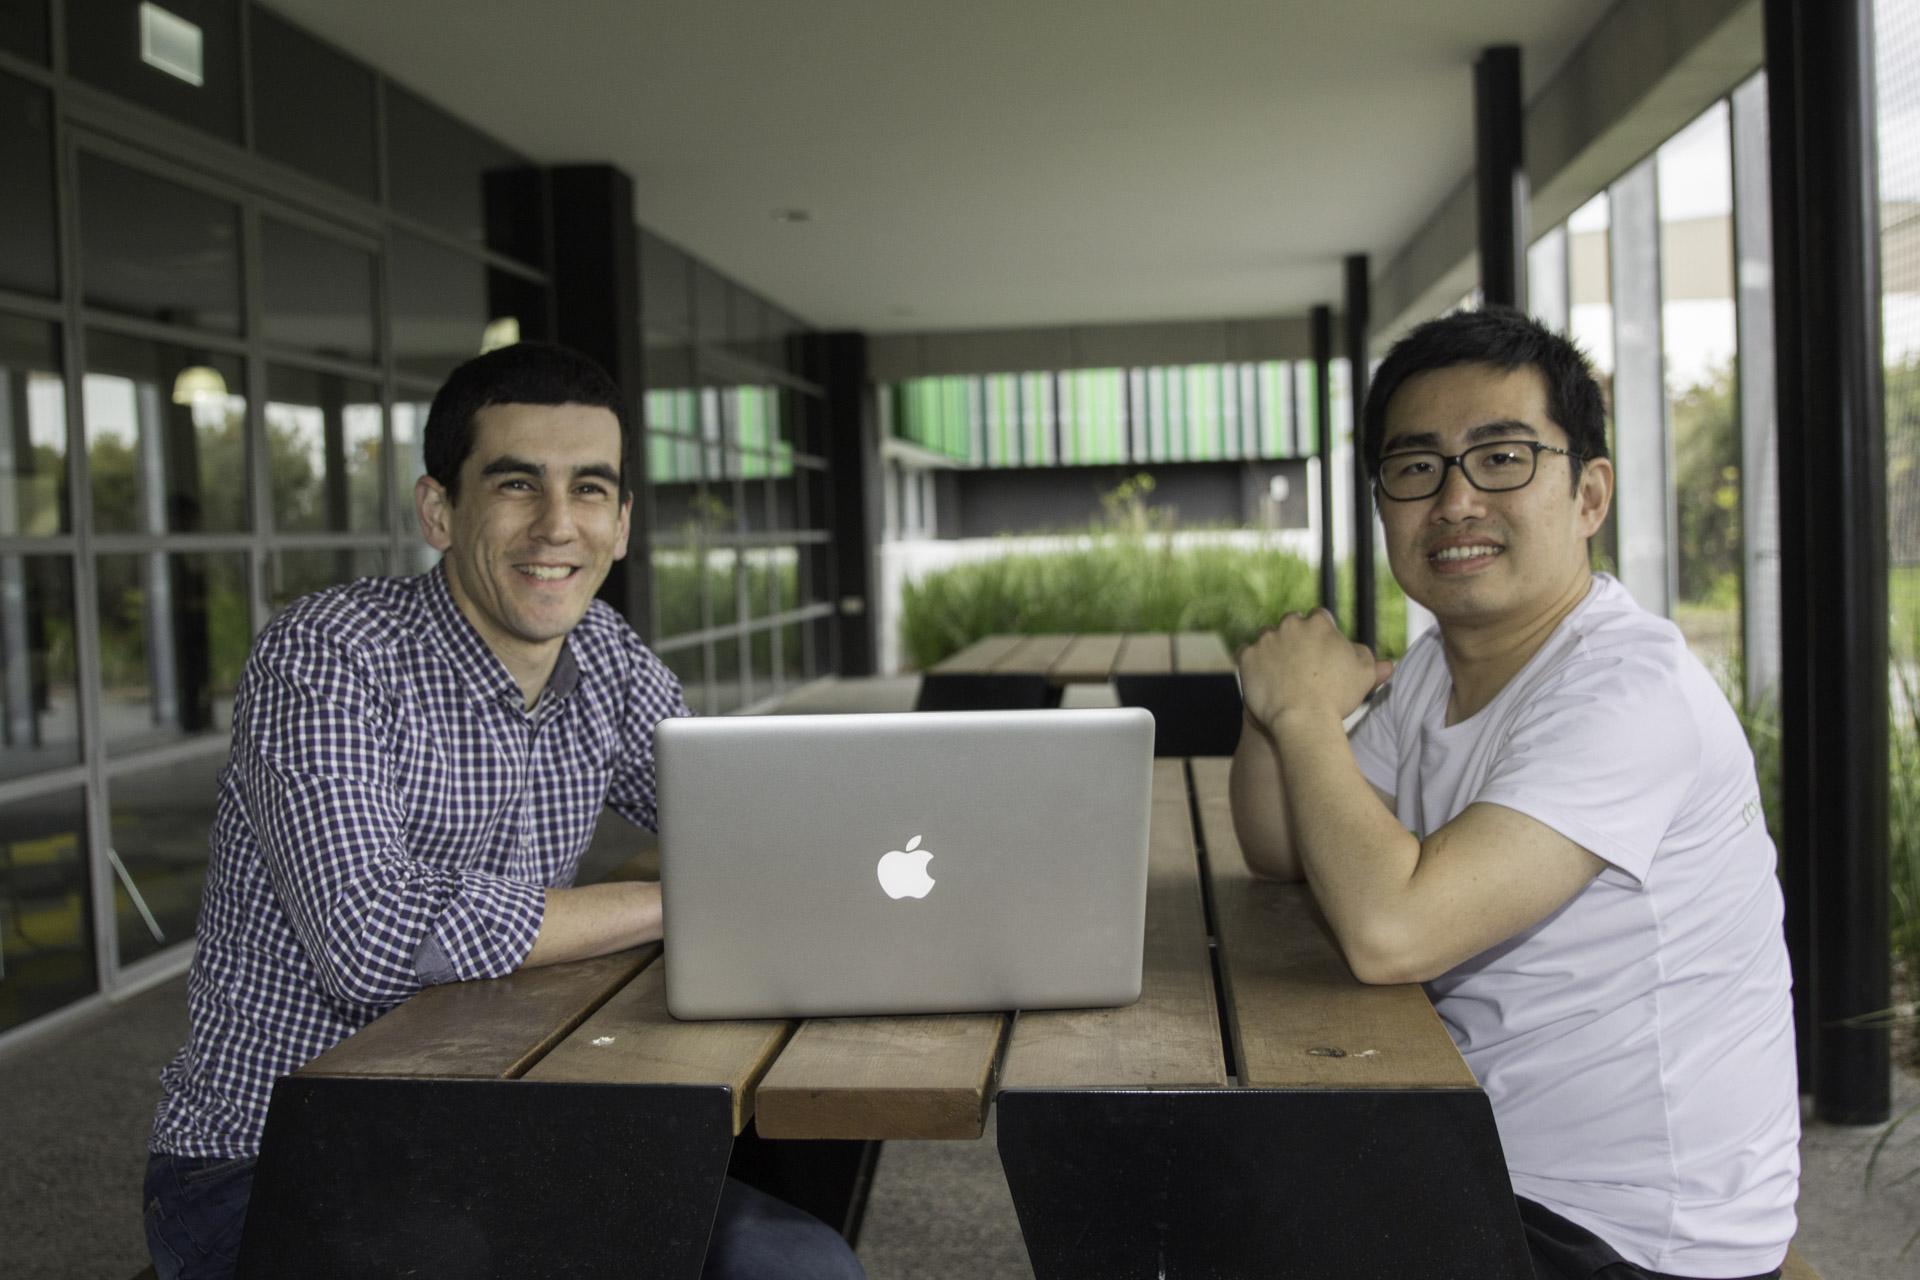 Silva Wei and Stephen Zuluaga